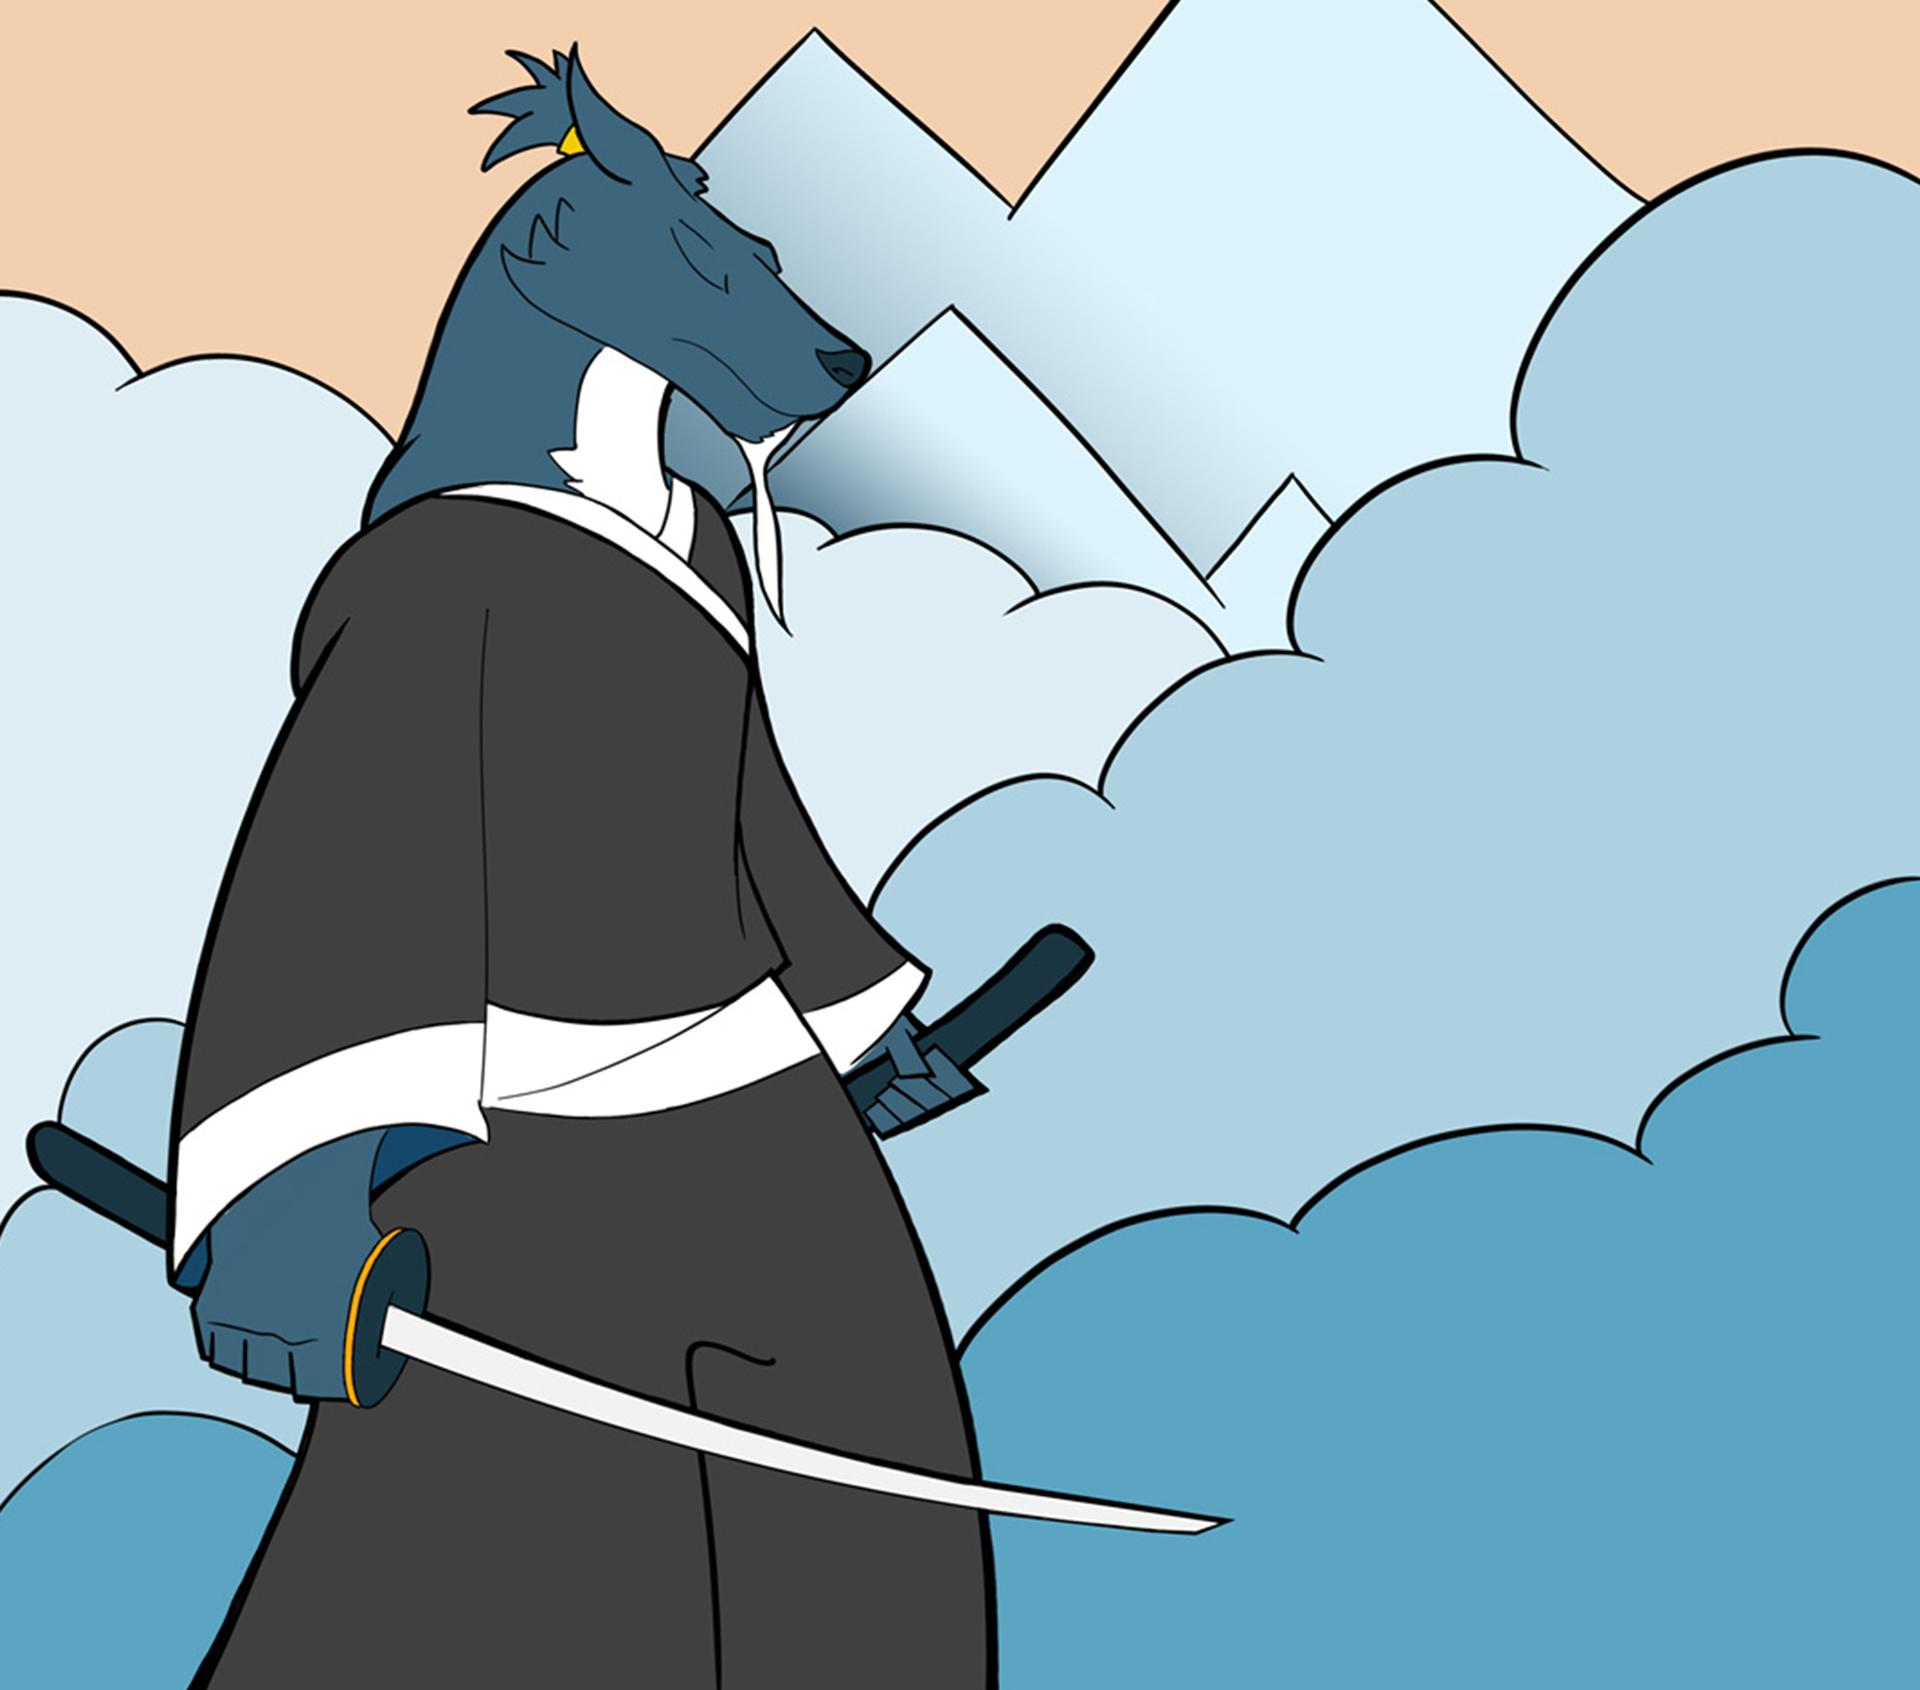 samurai-wolf-illustration-08.jpg